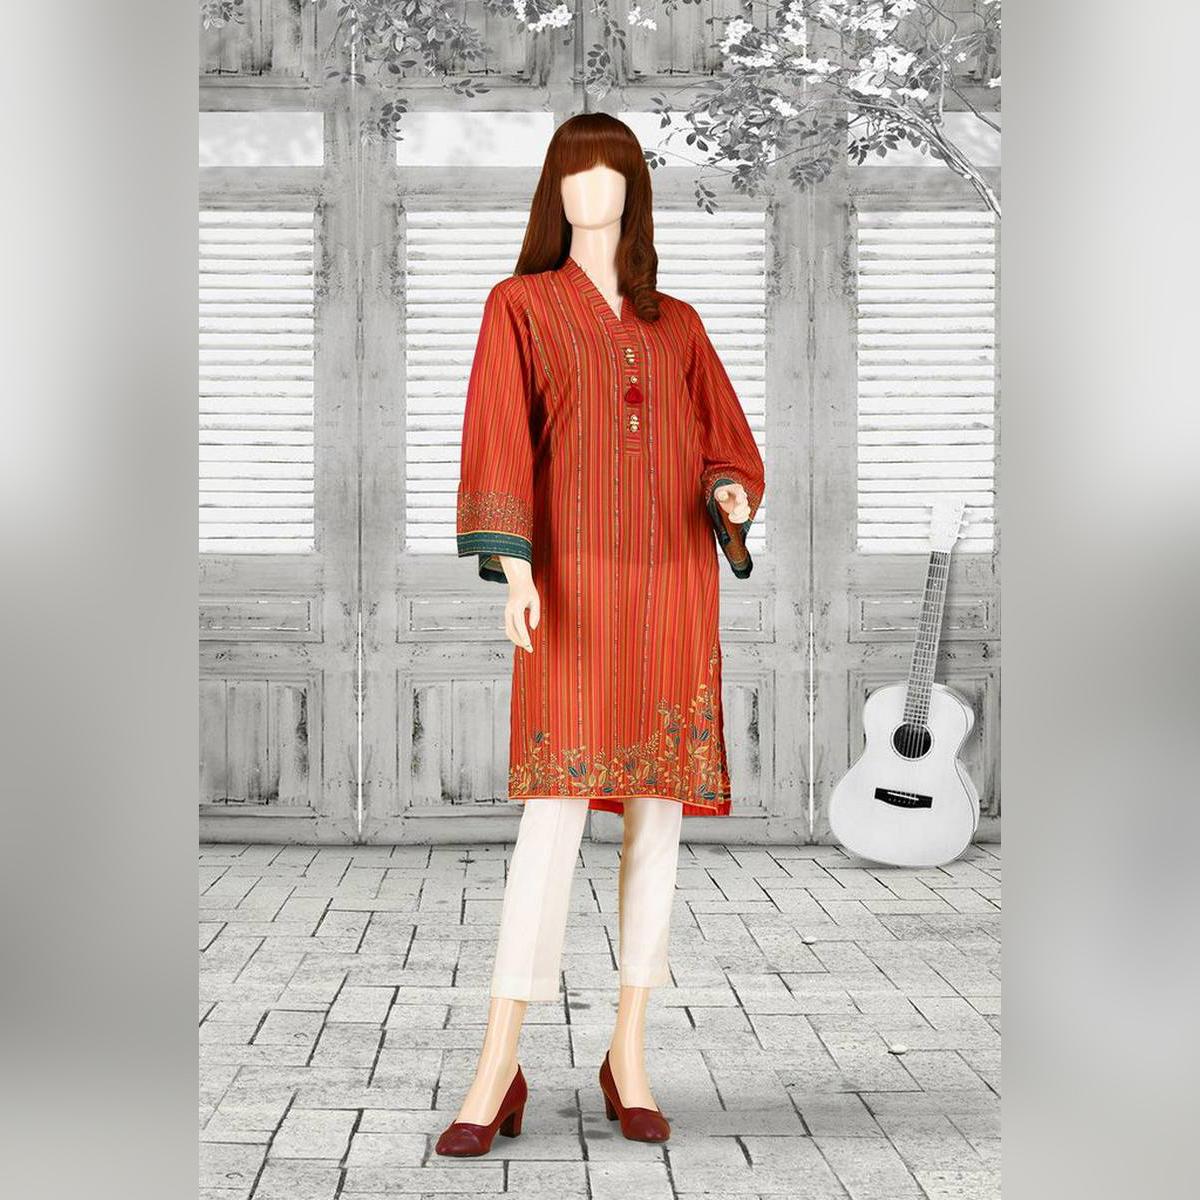 SAYA Orange Unstitch Printed Spring Summer 2021 Lawn Shirt for Women-HEATHER UO-2106-07B (SHIRT)